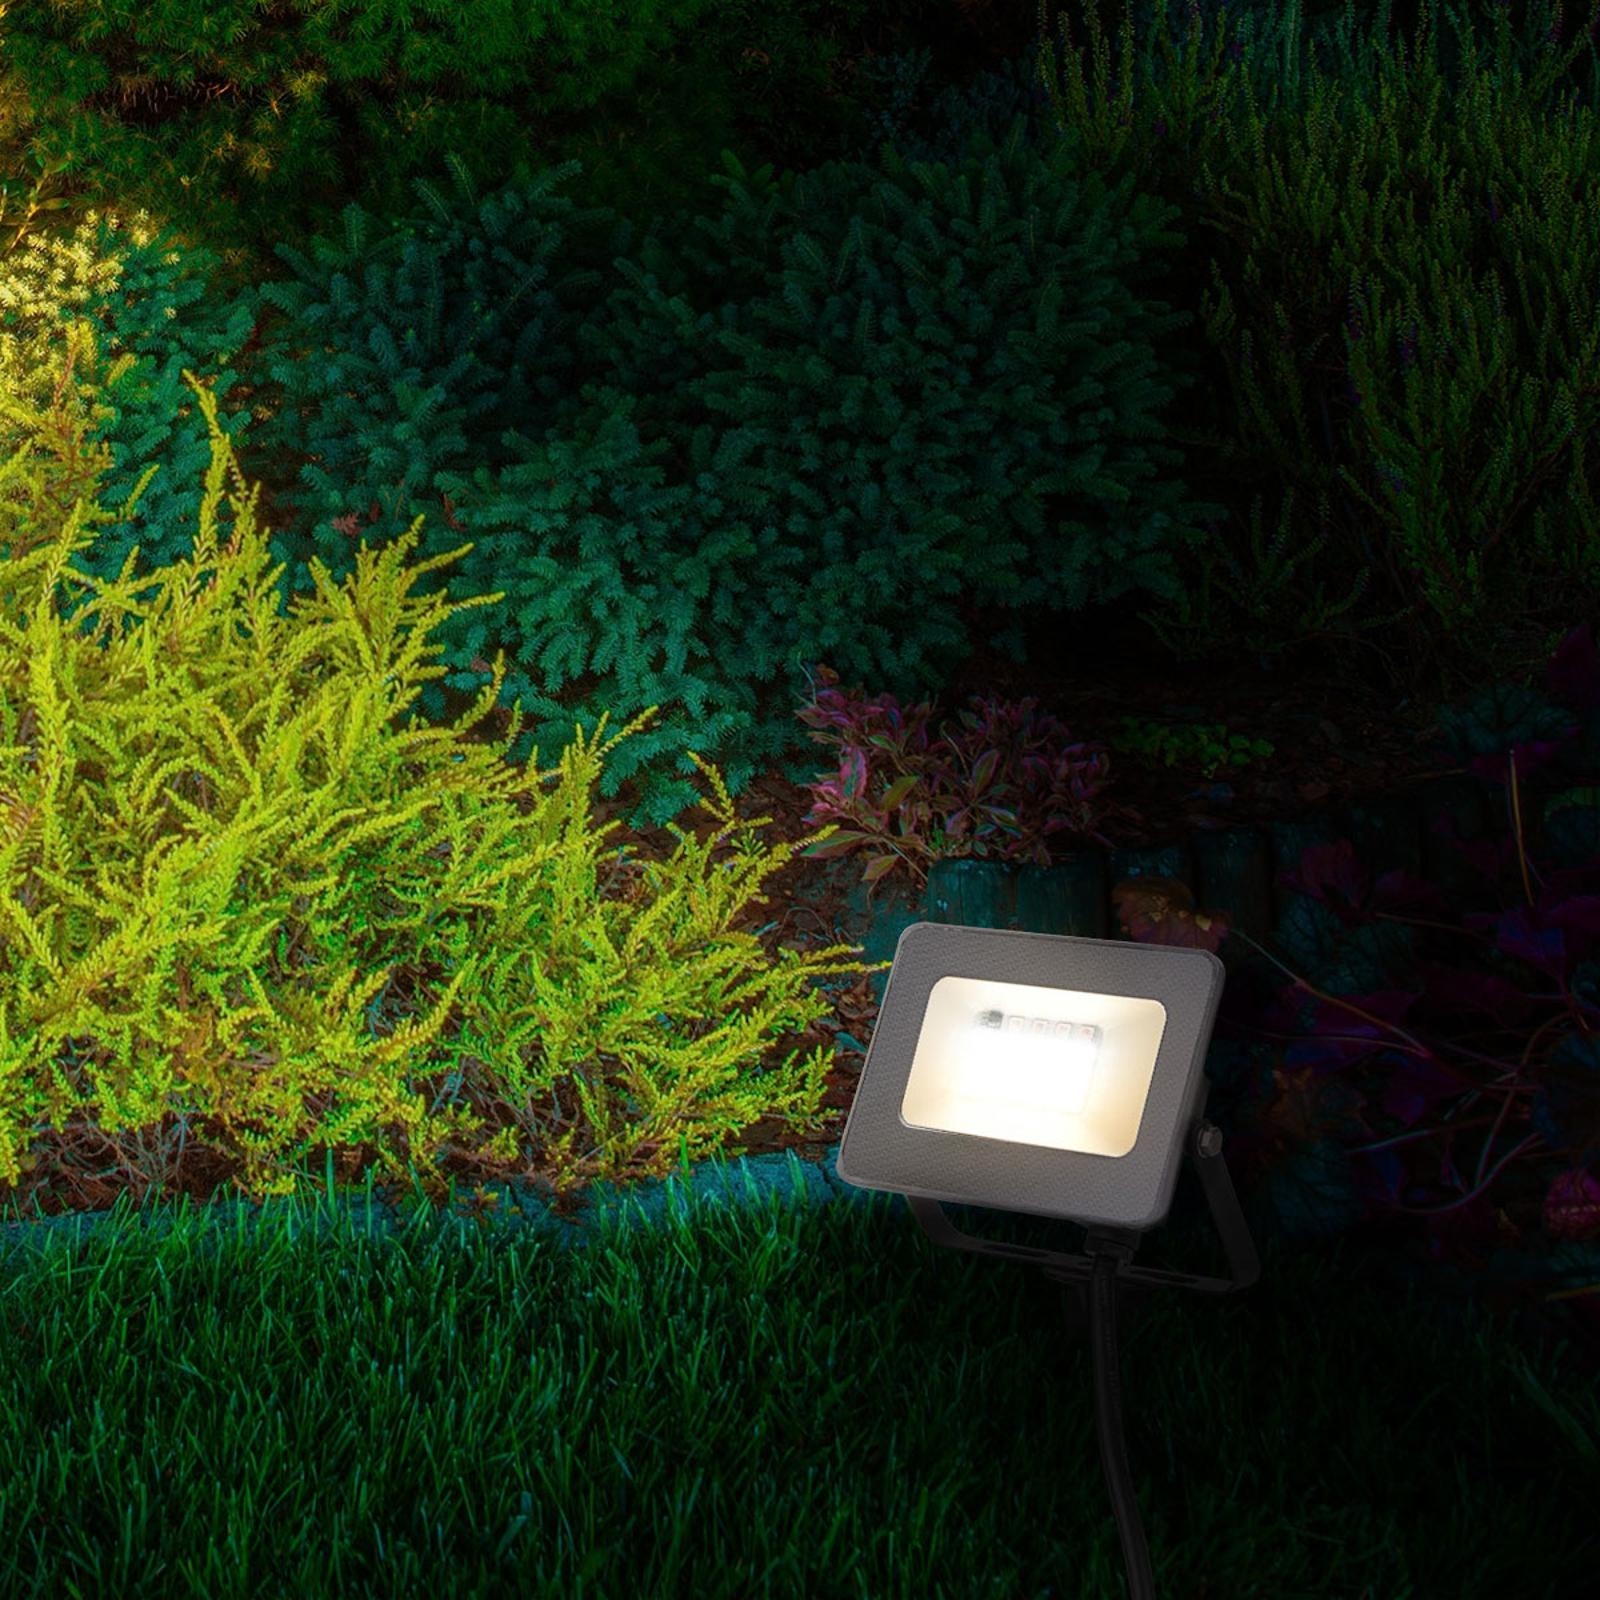 LED prikspot 5257661 met RGB-kleurverandering